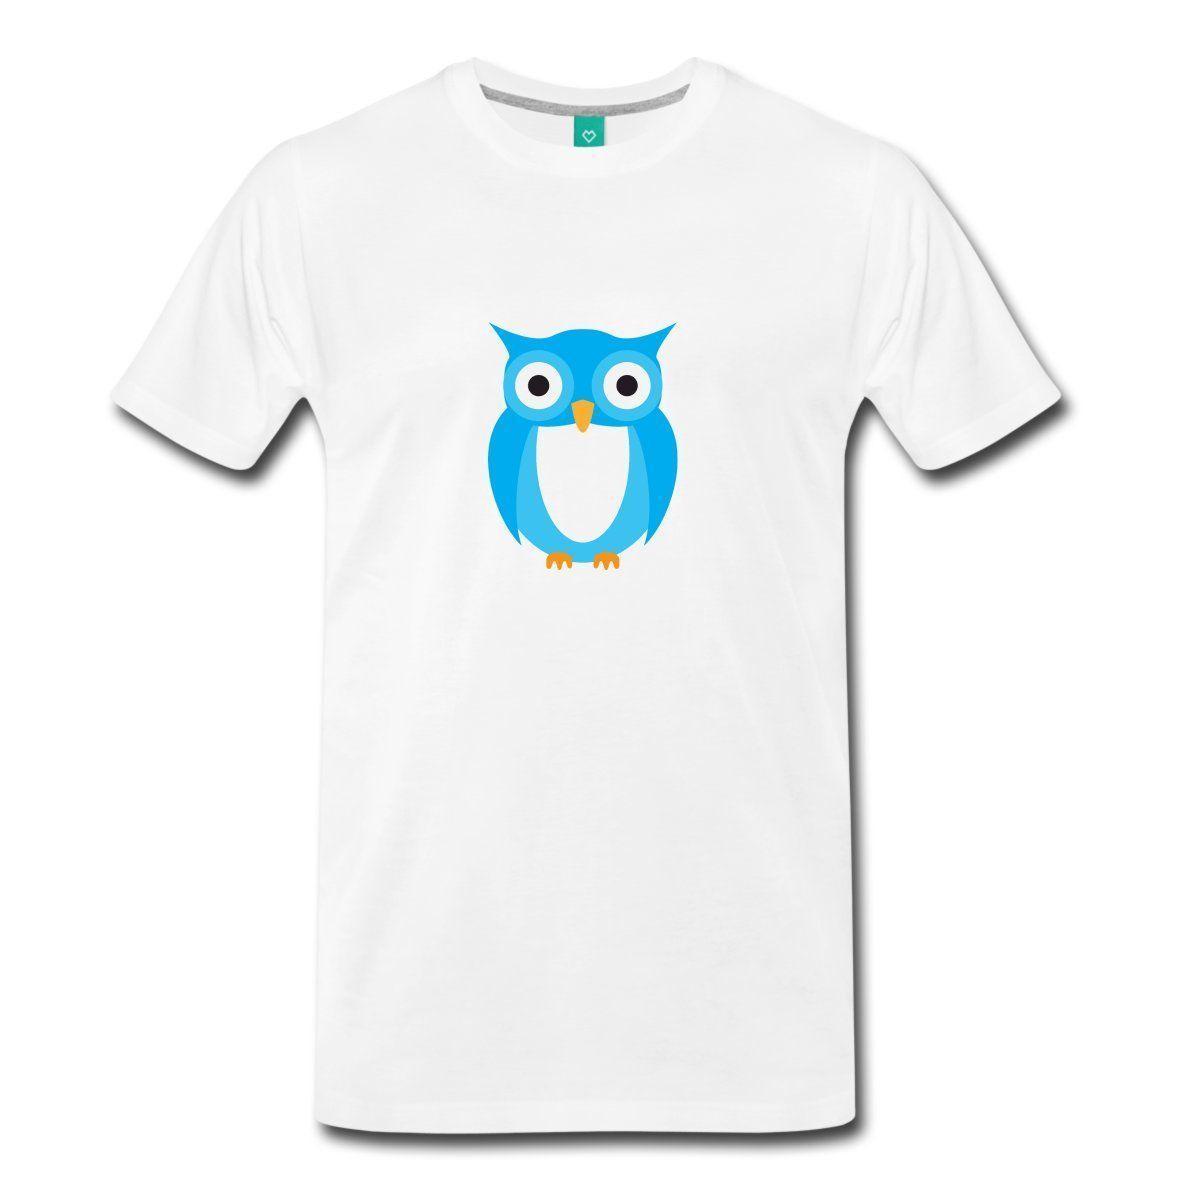 Clothing T Shirt Crew Neck Short Blue Owl Cartoon Compression Mens T Shirts  Funny T Shirt Designs Make A Tee Shirt From Shortshirteemachine b5082f770d49